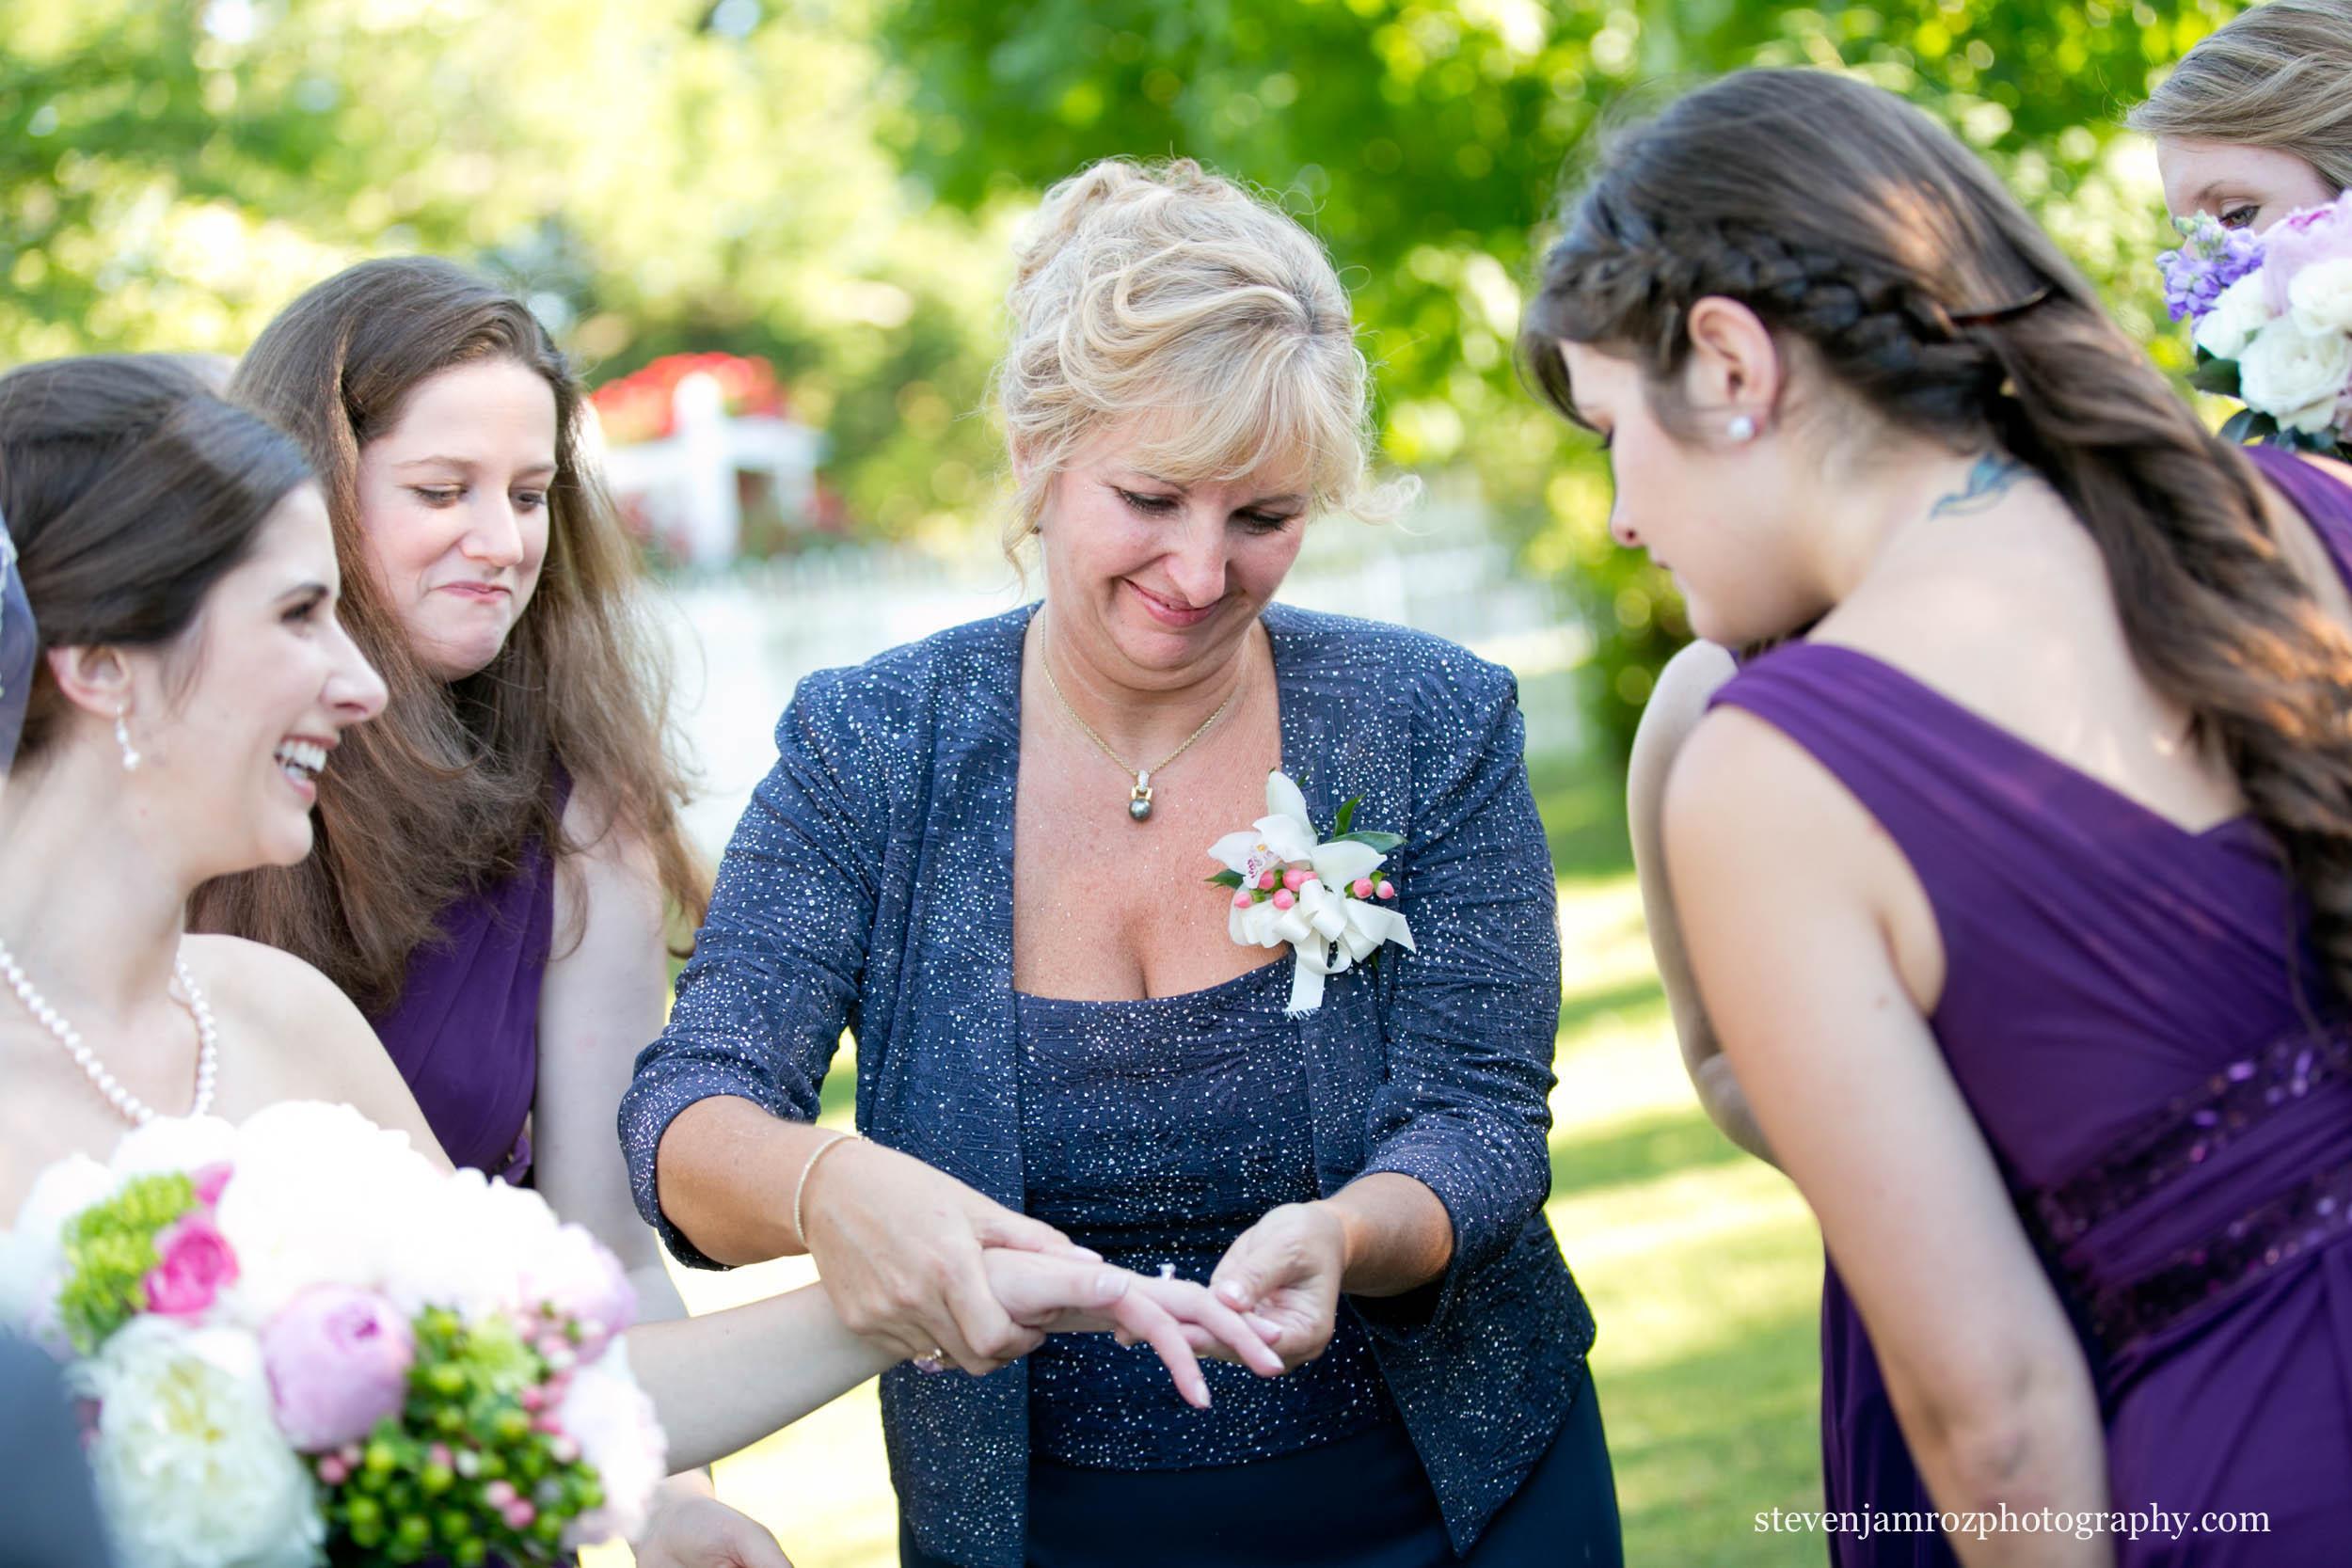 louisburg-nc-hudson-manor-wedding photographer-steven-jamroz-0663.jpg